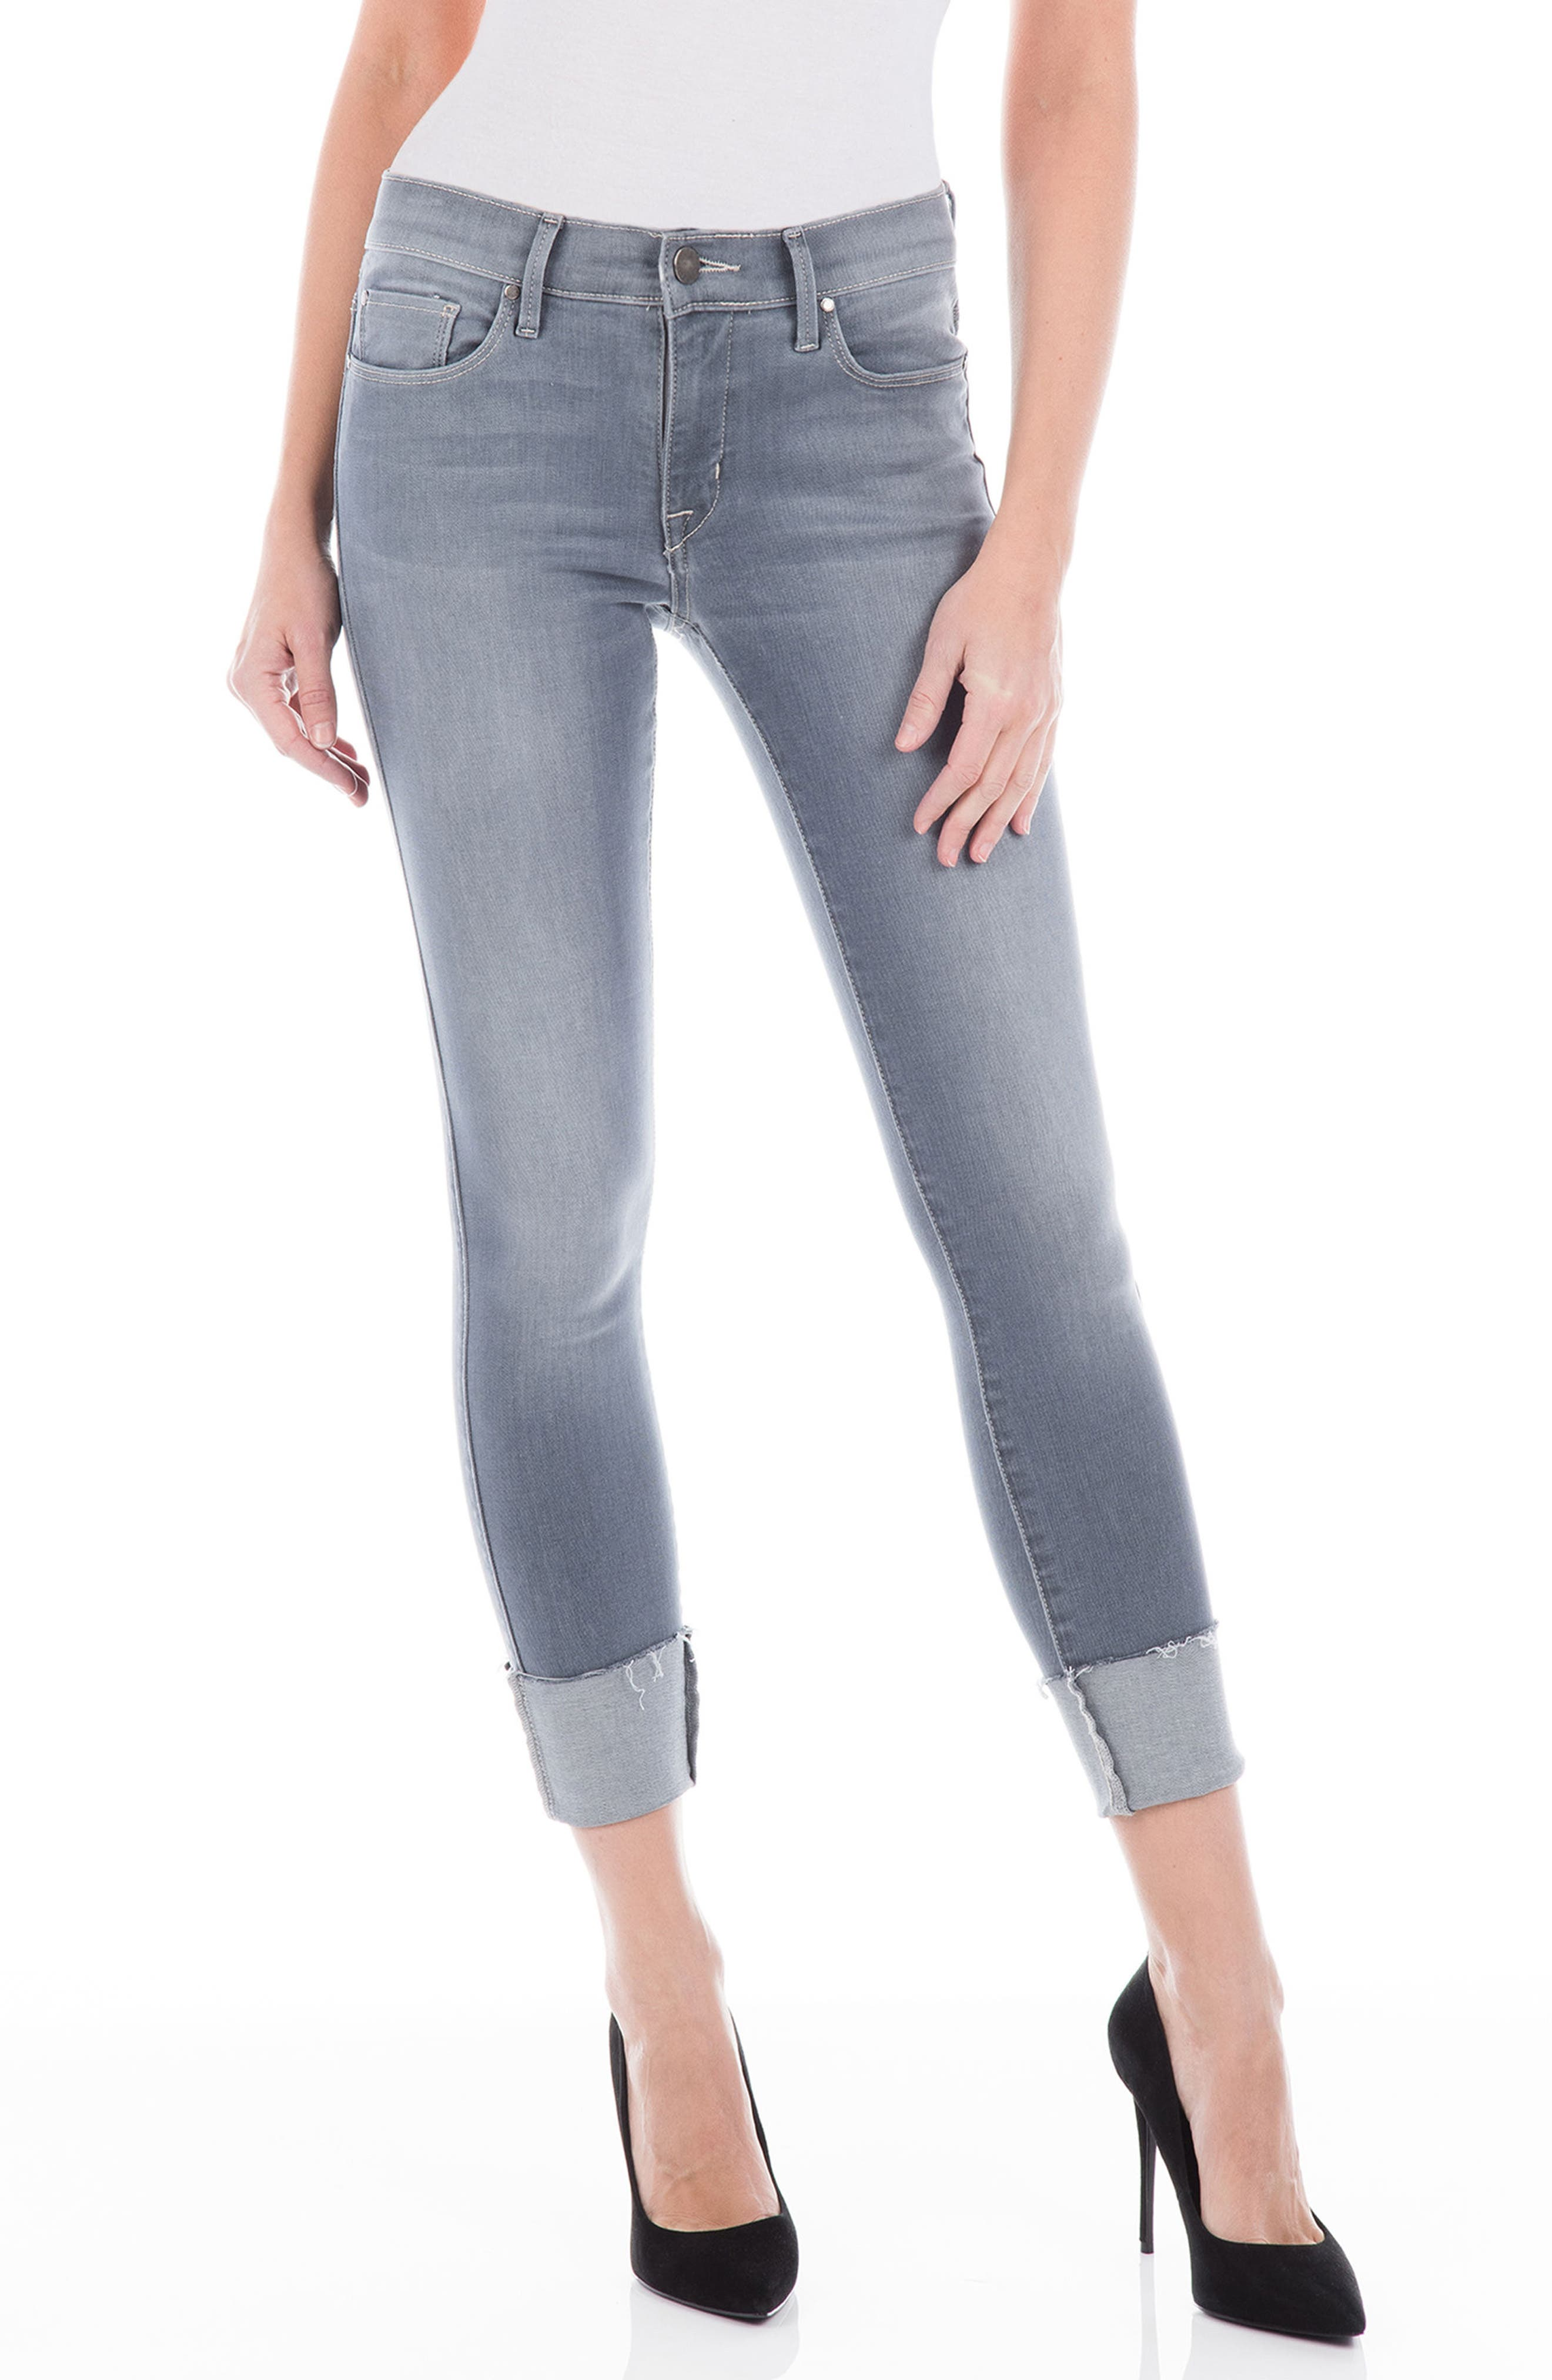 Belvedere Crop Skinny Jeans,                         Main,                         color, 020